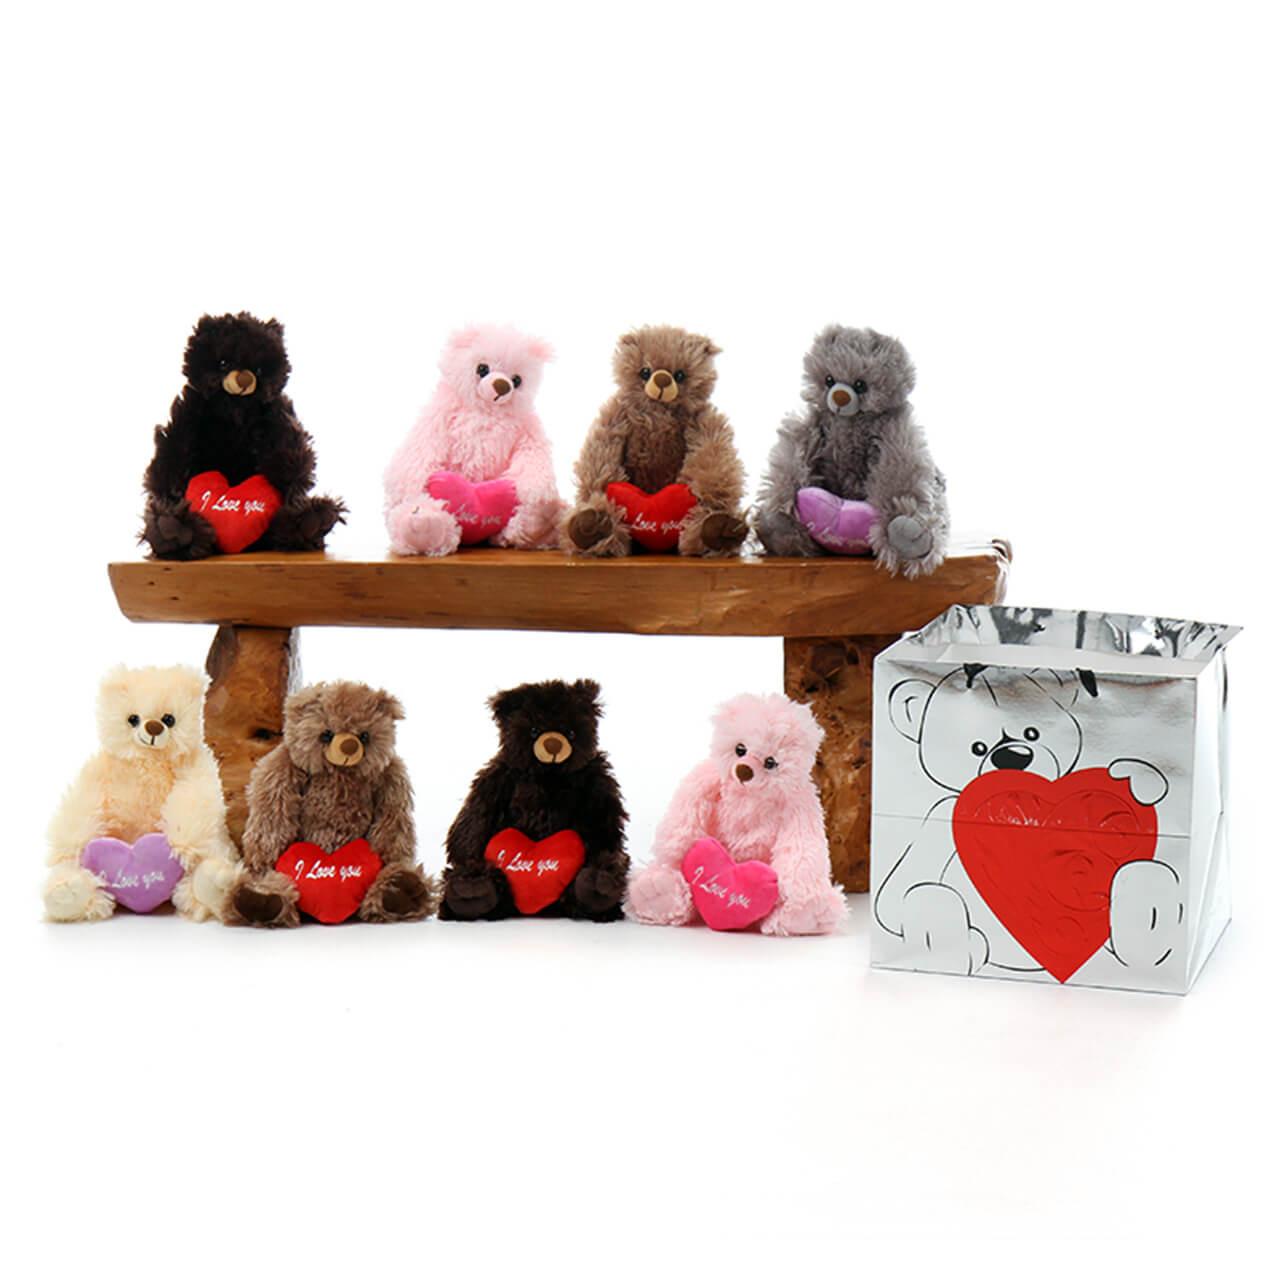 Giant Teddy Deal! 8 Teddy Bears for great price!